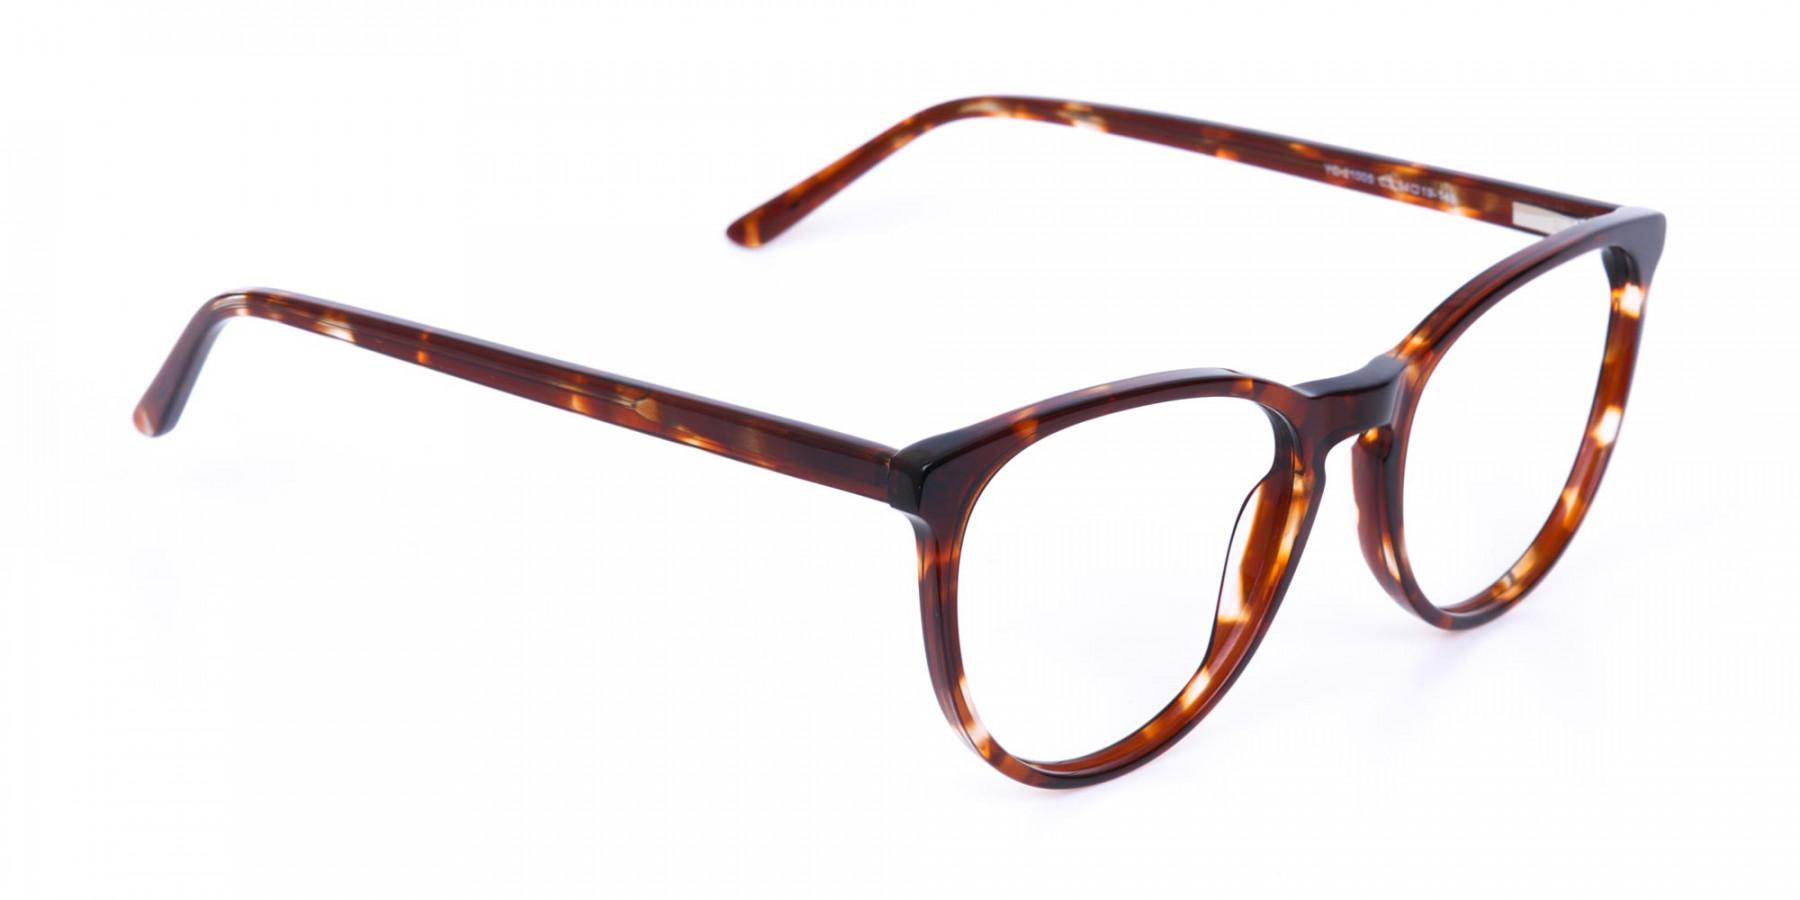 Tortoise Acetate Round Eyeglasses Unisex-1